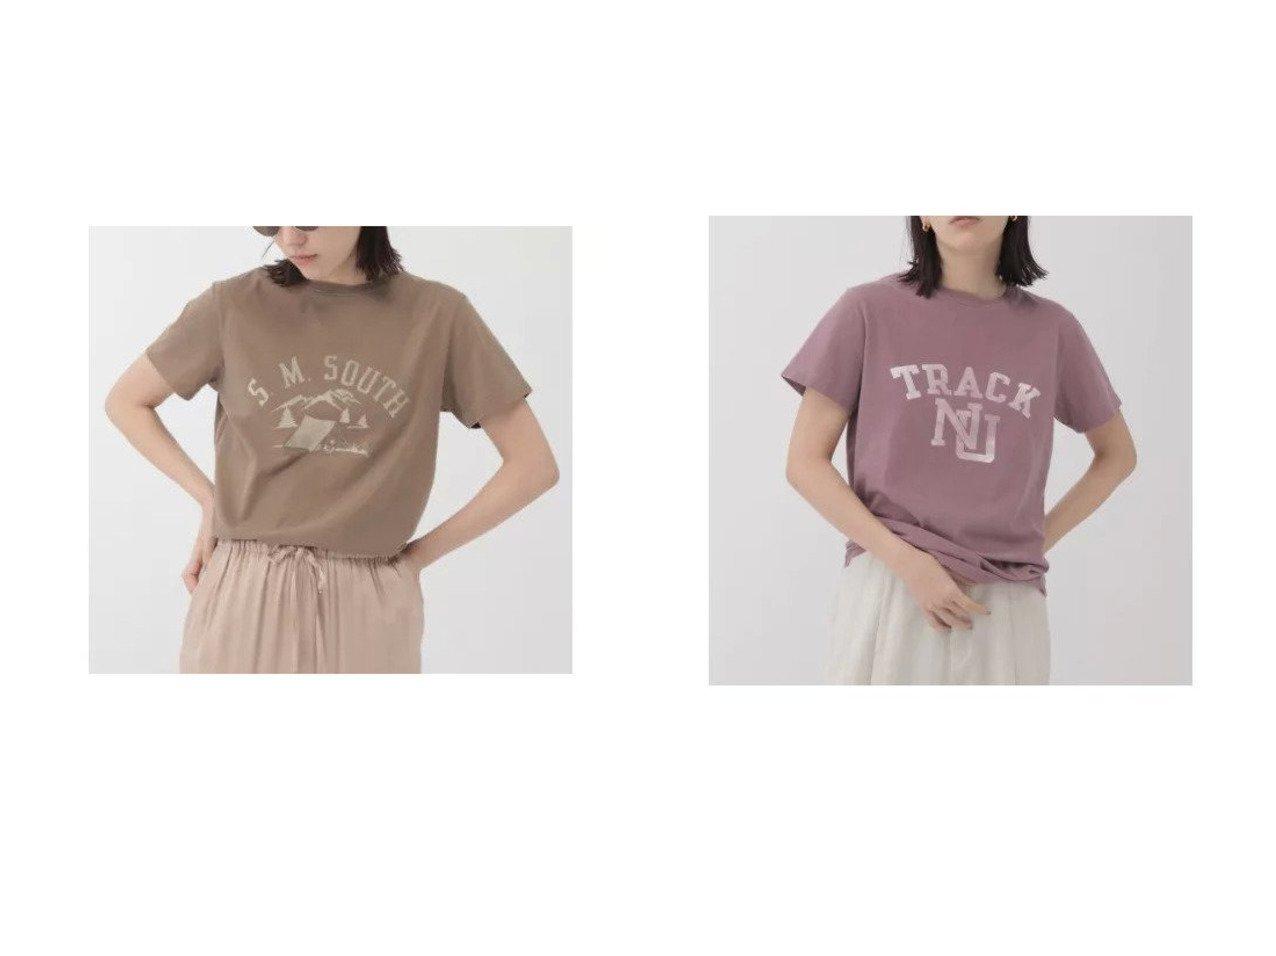 【Chaos/カオス】の【REMI RELIEF】SMSOUTH プリントTシャツ&【REMI RELIEF】TRACK プリントTシャツ 【トップス・カットソー】おすすめ!人気、トレンド・レディースファッションの通販 おすすめで人気の流行・トレンド、ファッションの通販商品 メンズファッション・キッズファッション・インテリア・家具・レディースファッション・服の通販 founy(ファニー) https://founy.com/ ファッション Fashion レディースファッション WOMEN トップス・カットソー Tops/Tshirt シャツ/ブラウス Shirts/Blouses ロング / Tシャツ T-Shirts カットソー Cut and Sewn アメリカン ヴィンテージ カットソー パターン プリント ベーシック 半袖 |ID:crp329100000029398